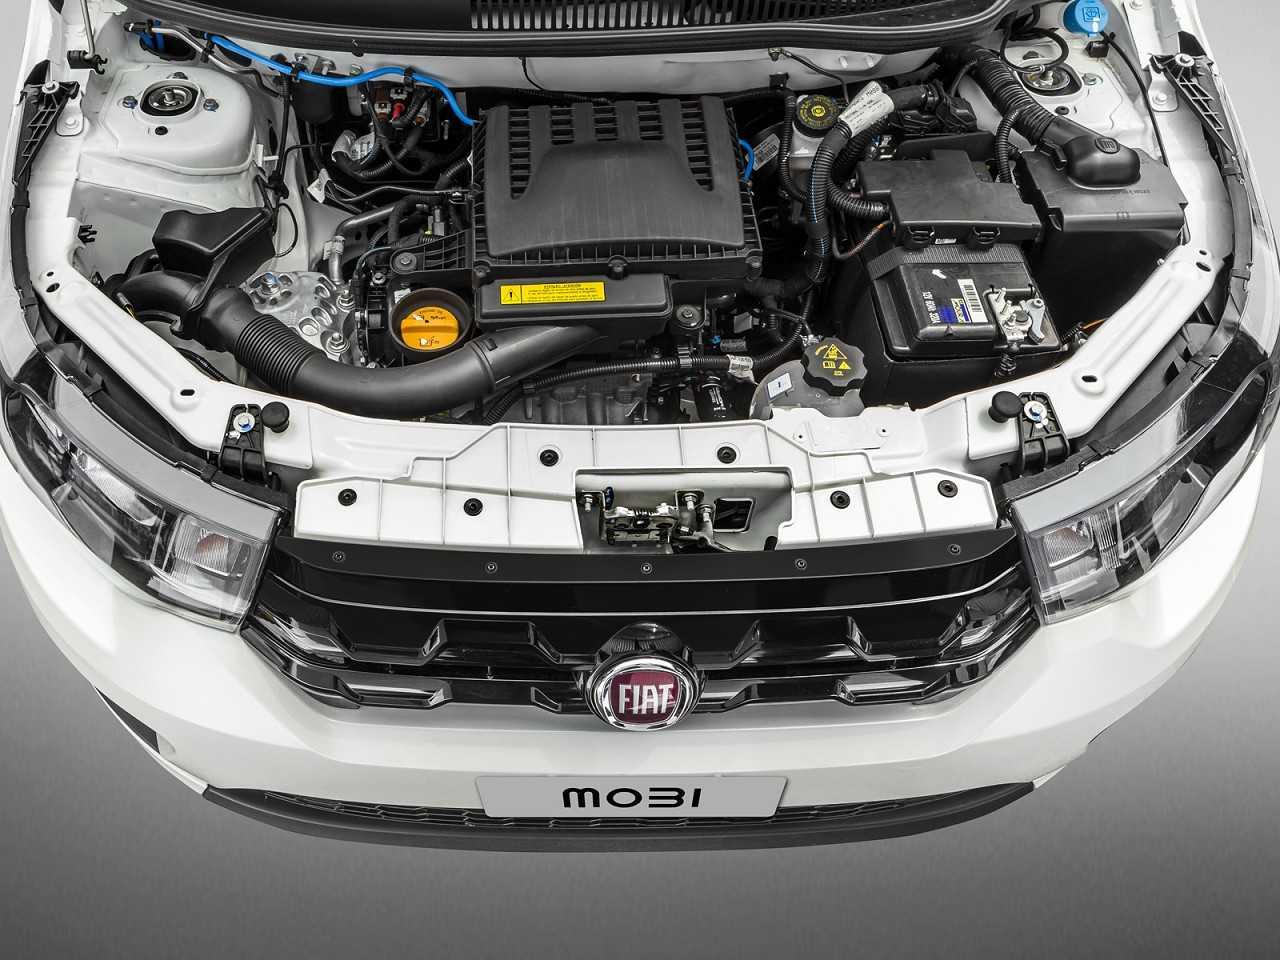 FiatMobi 2017 - motor